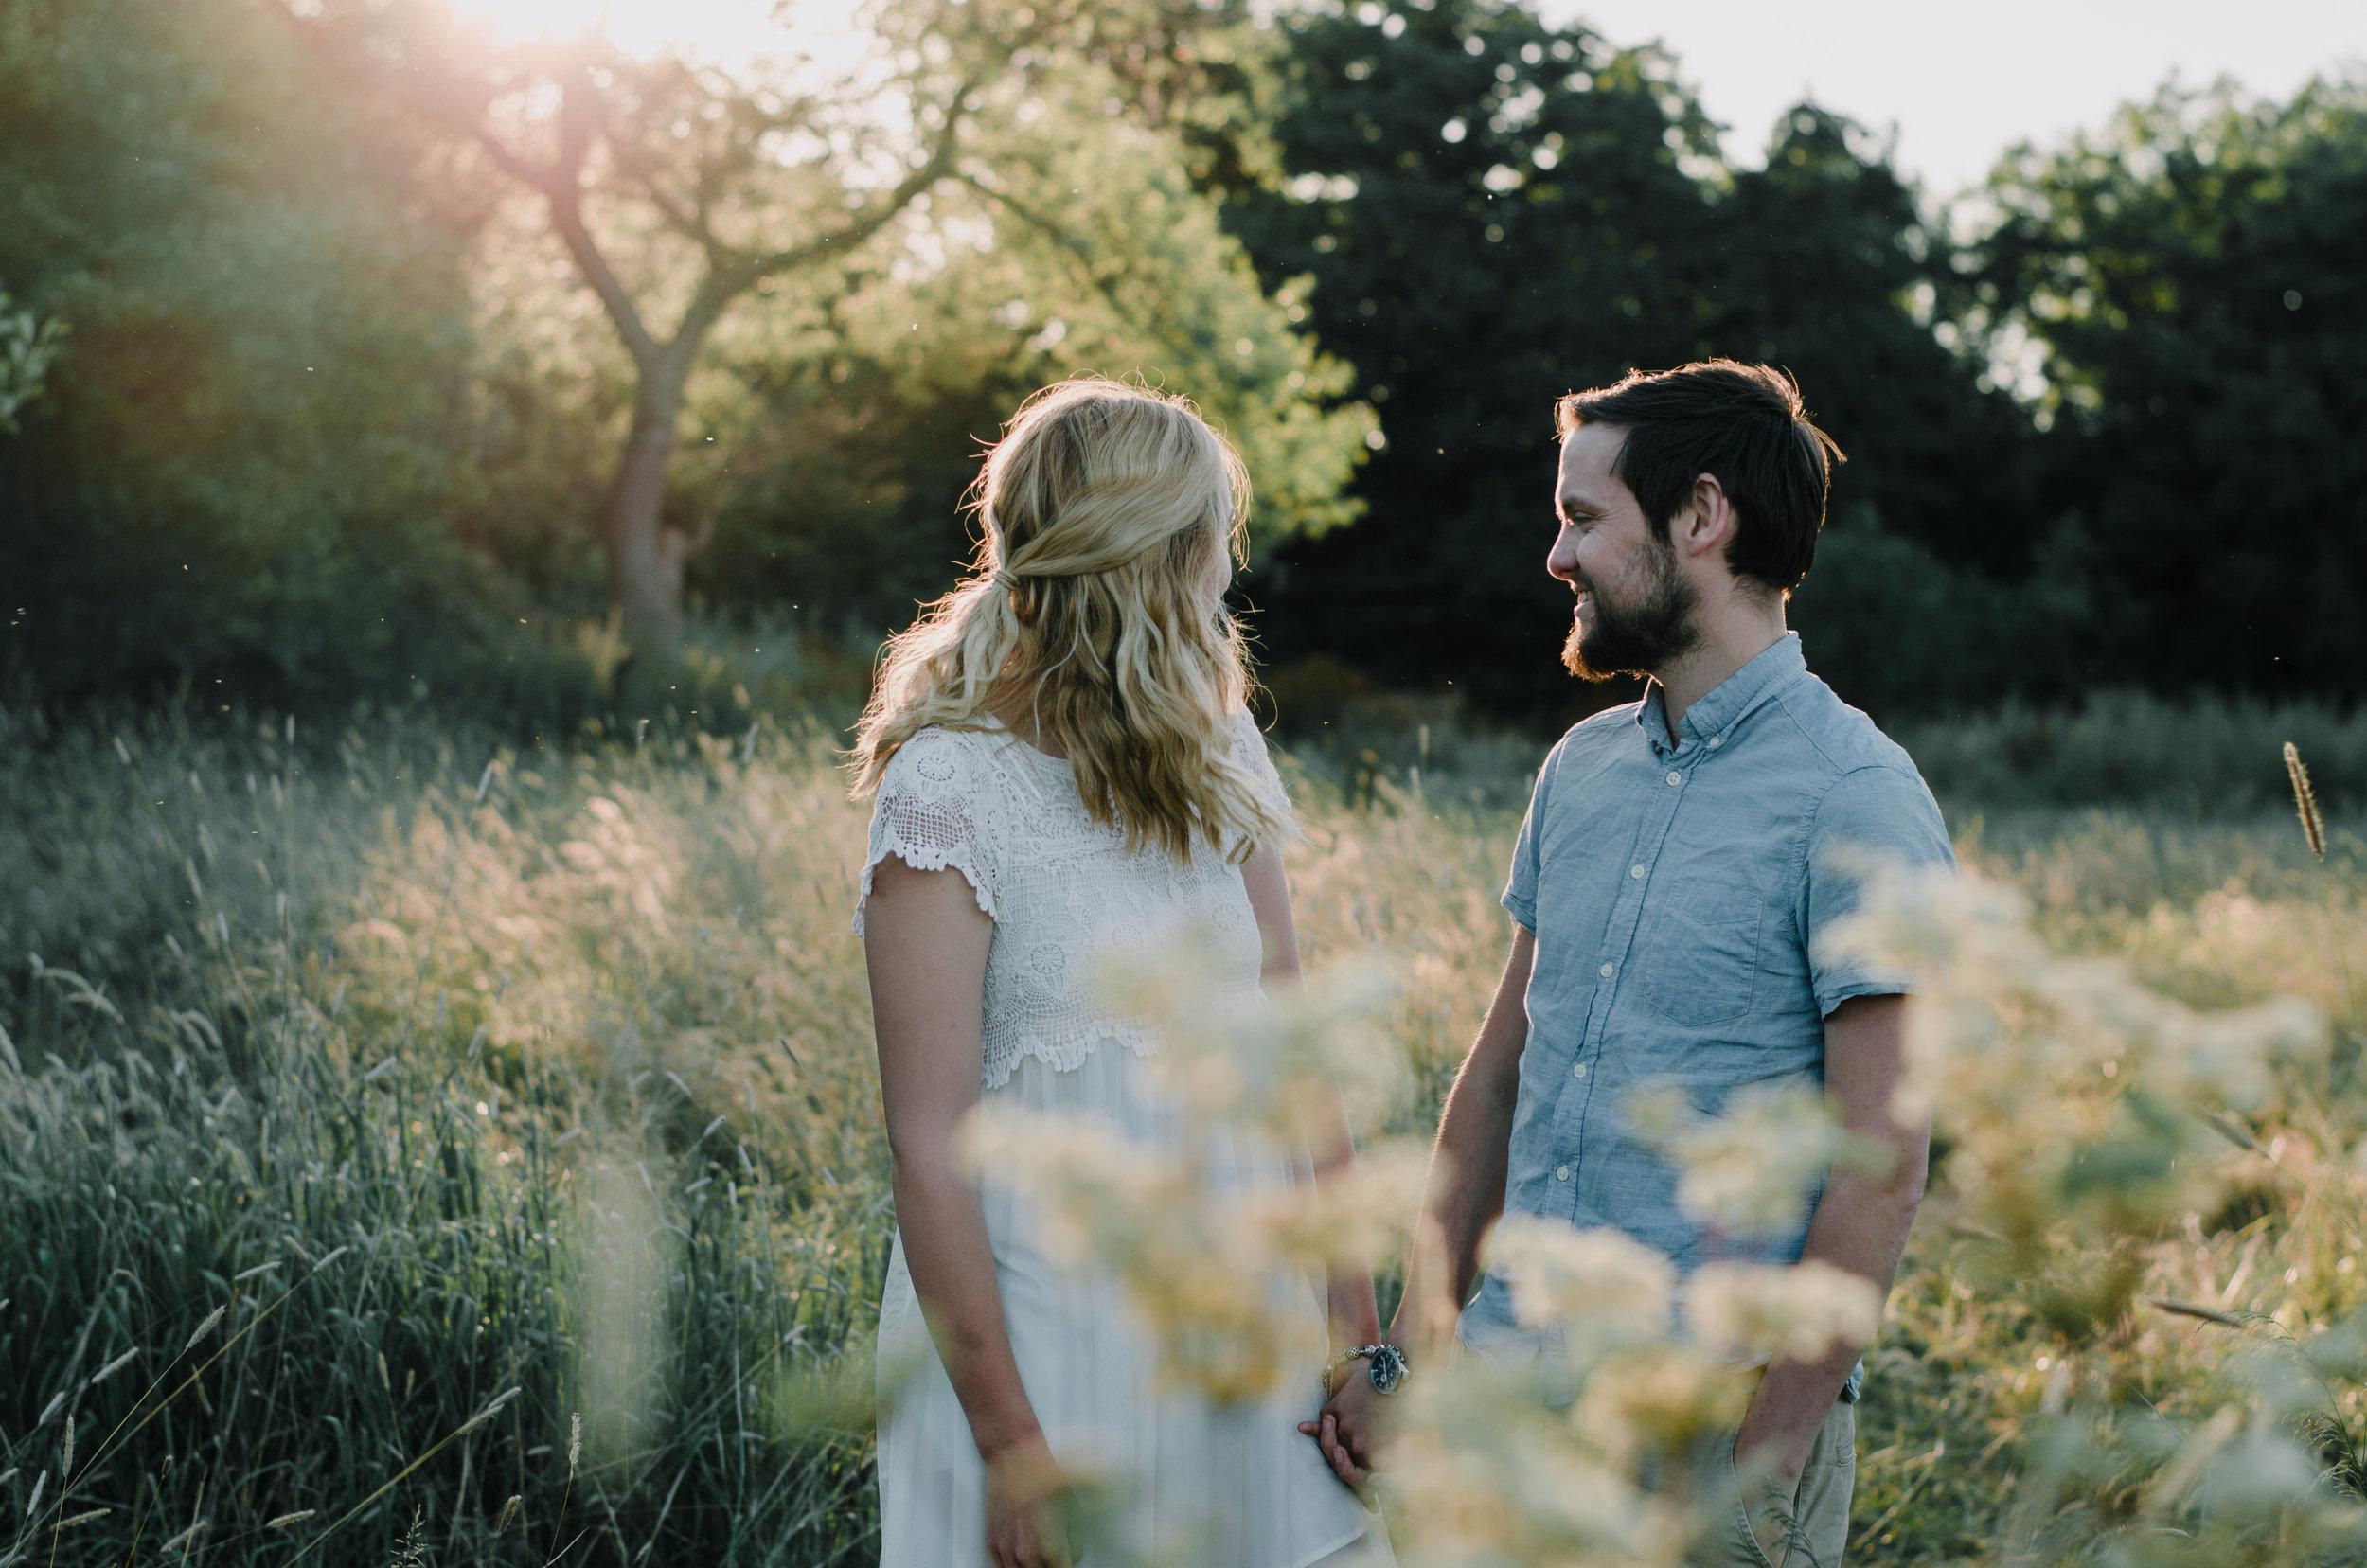 Gina & Chris - Barcombe Mills - Couple Session - Aiste Saulyte Photography-26.jpg